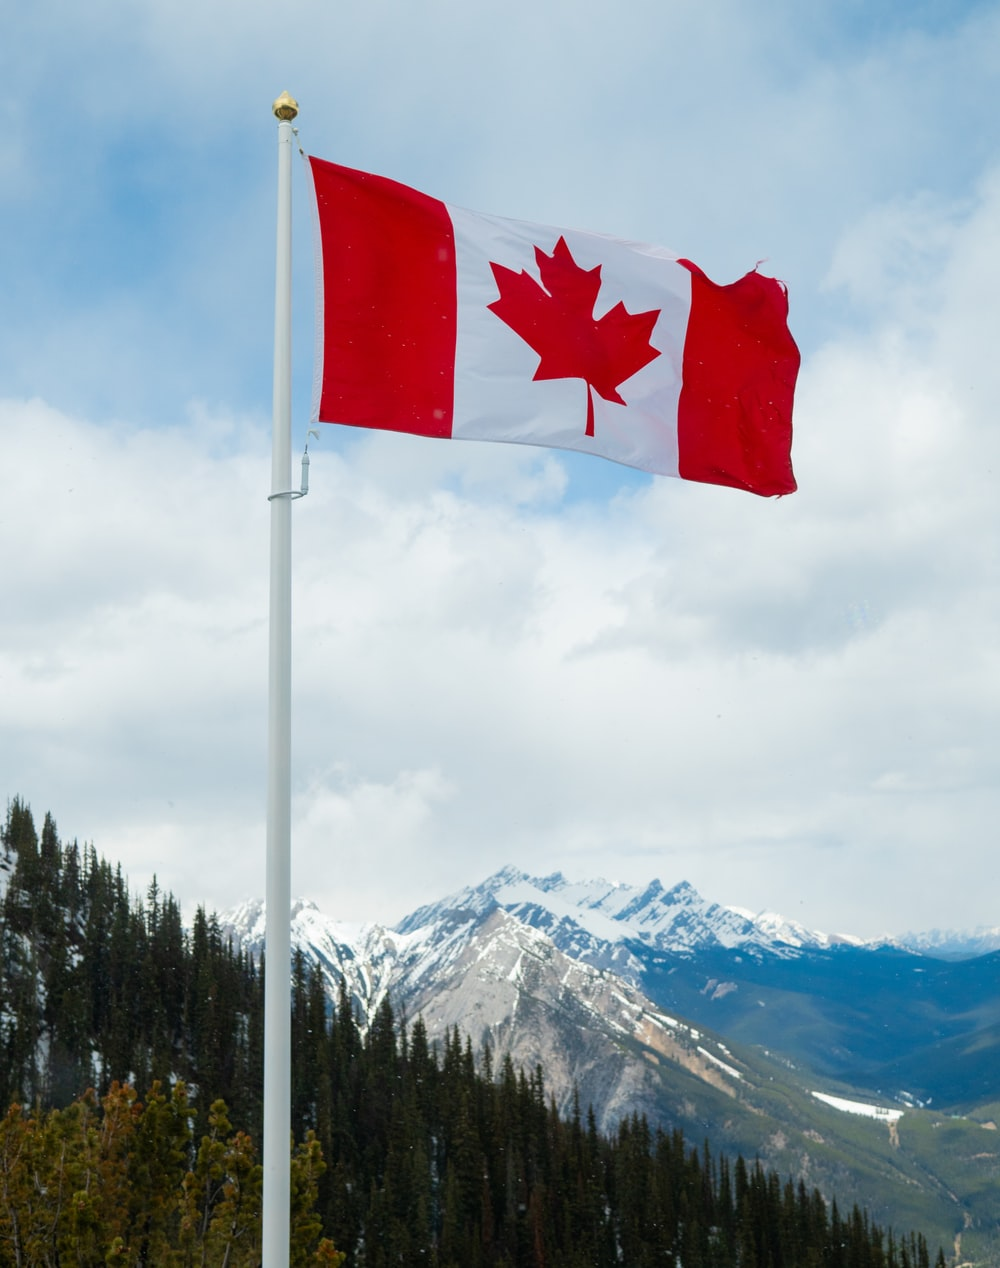 shallow focus photo of Canada flag